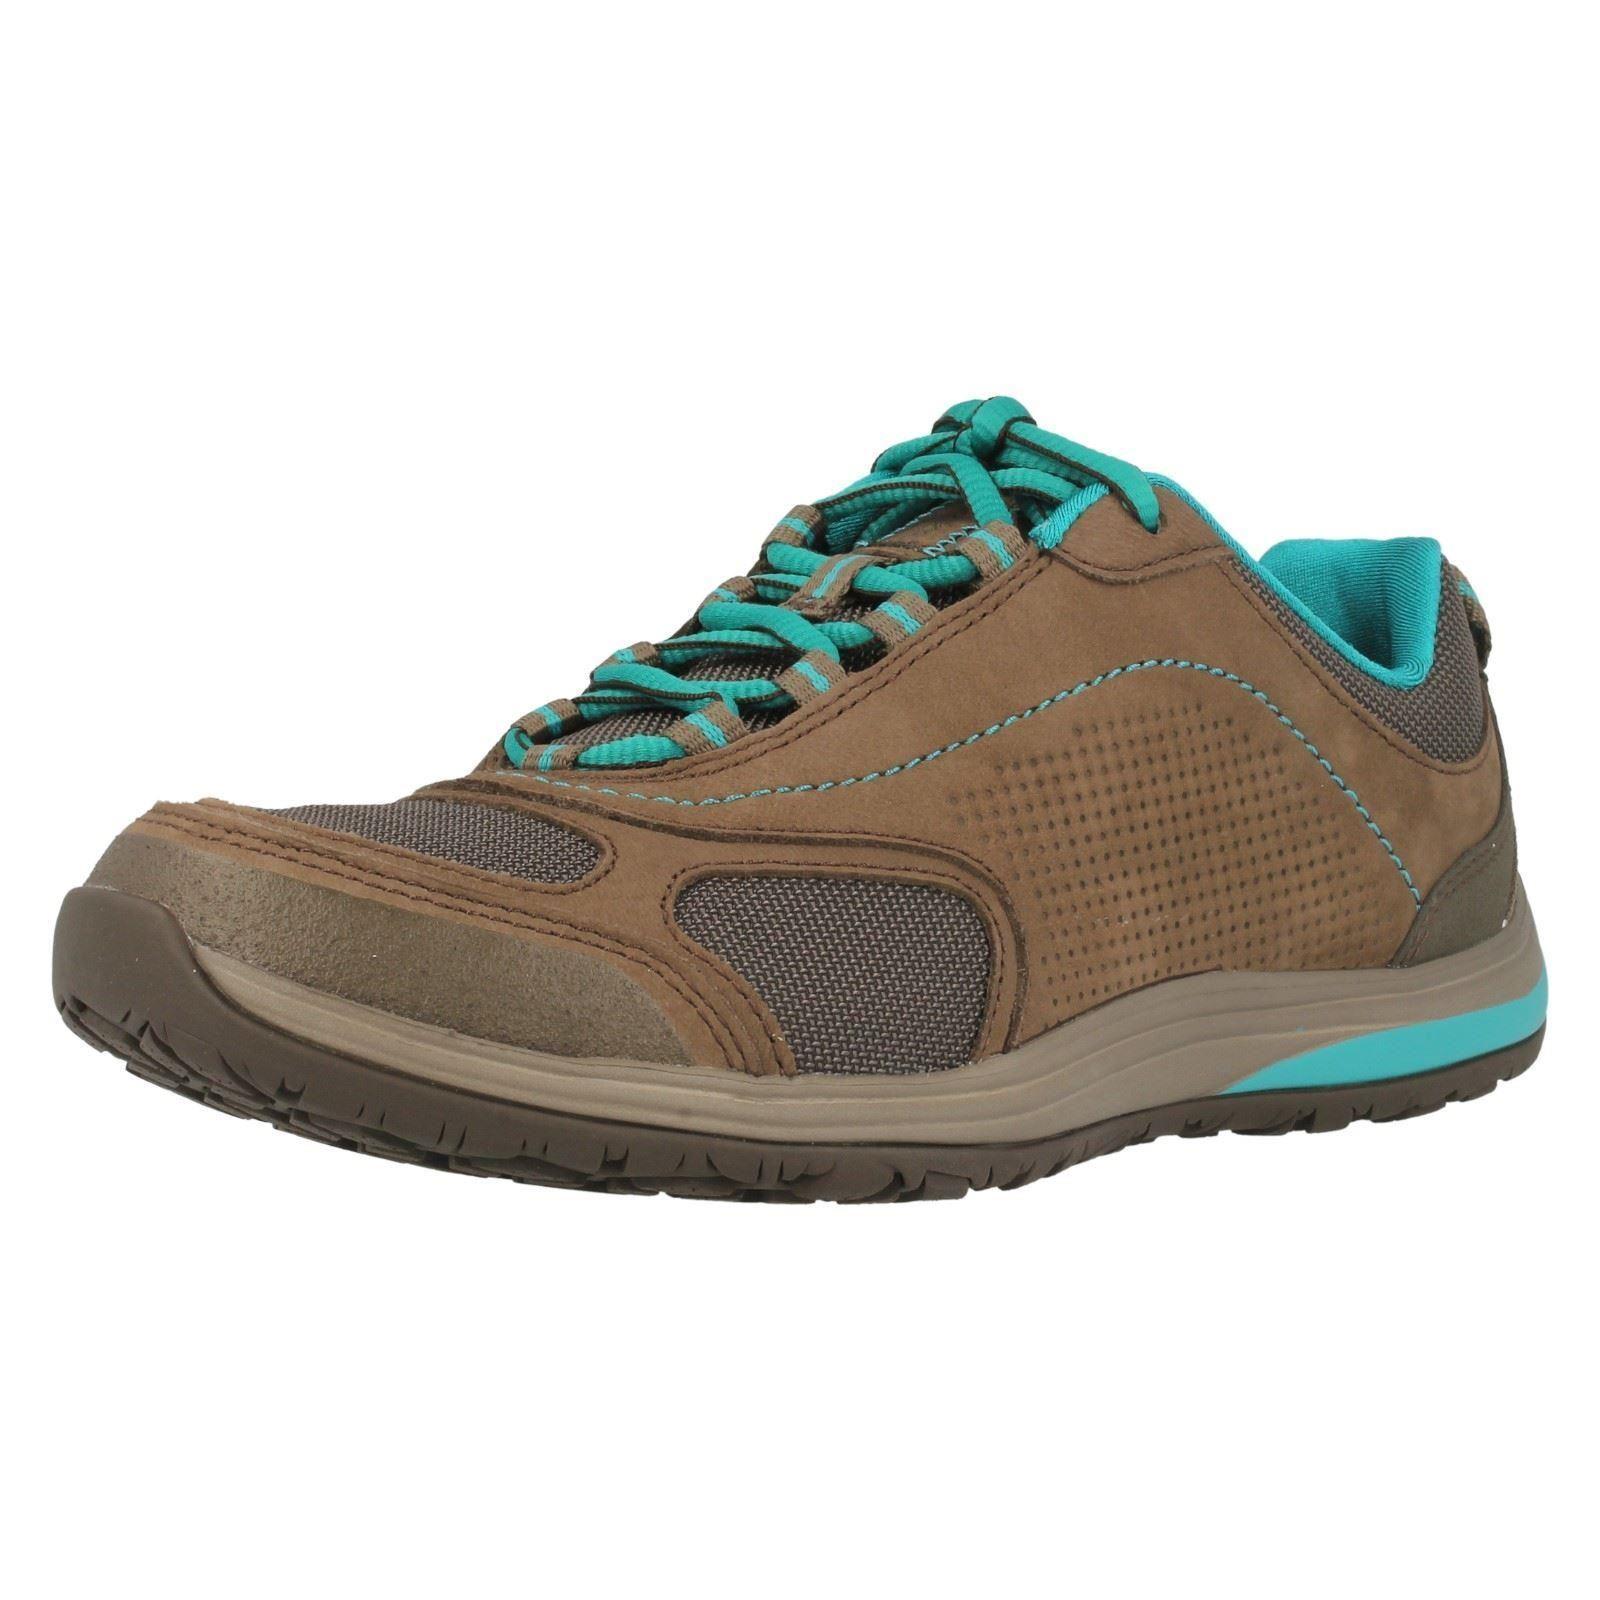 Sandalo Donna Clarks Ginnastica Da Route